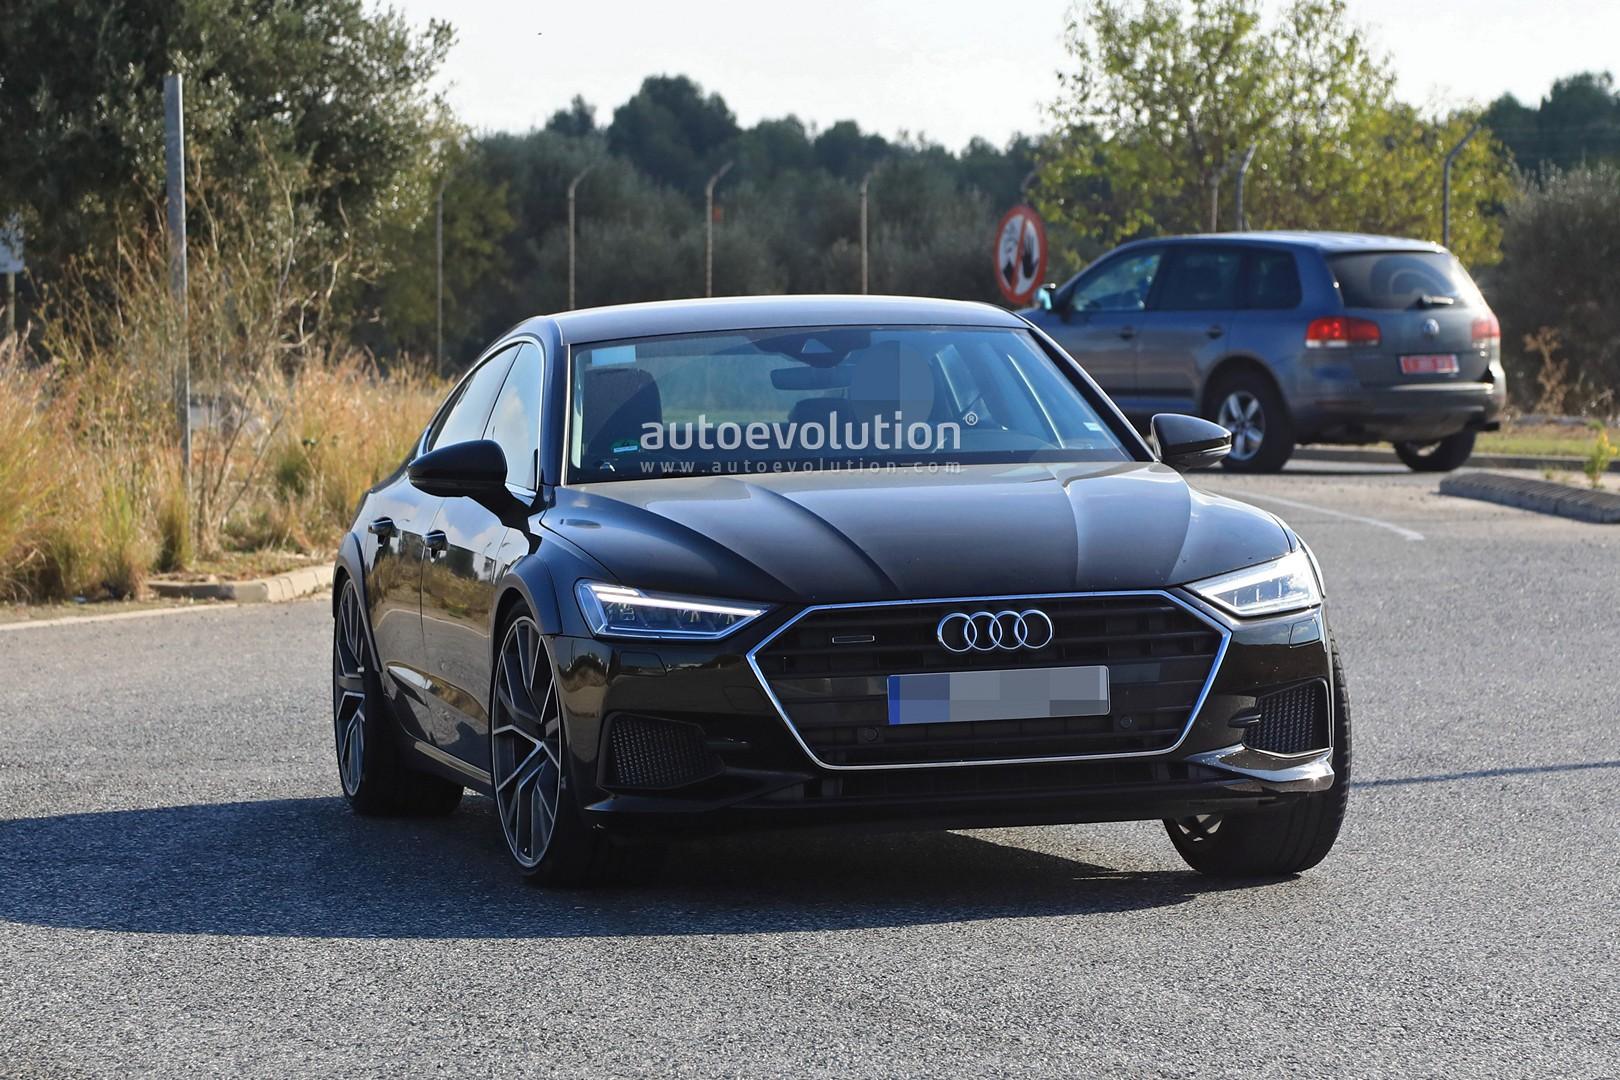 2019 Audi Rs7 Test Mule Makes Spyshots Debut